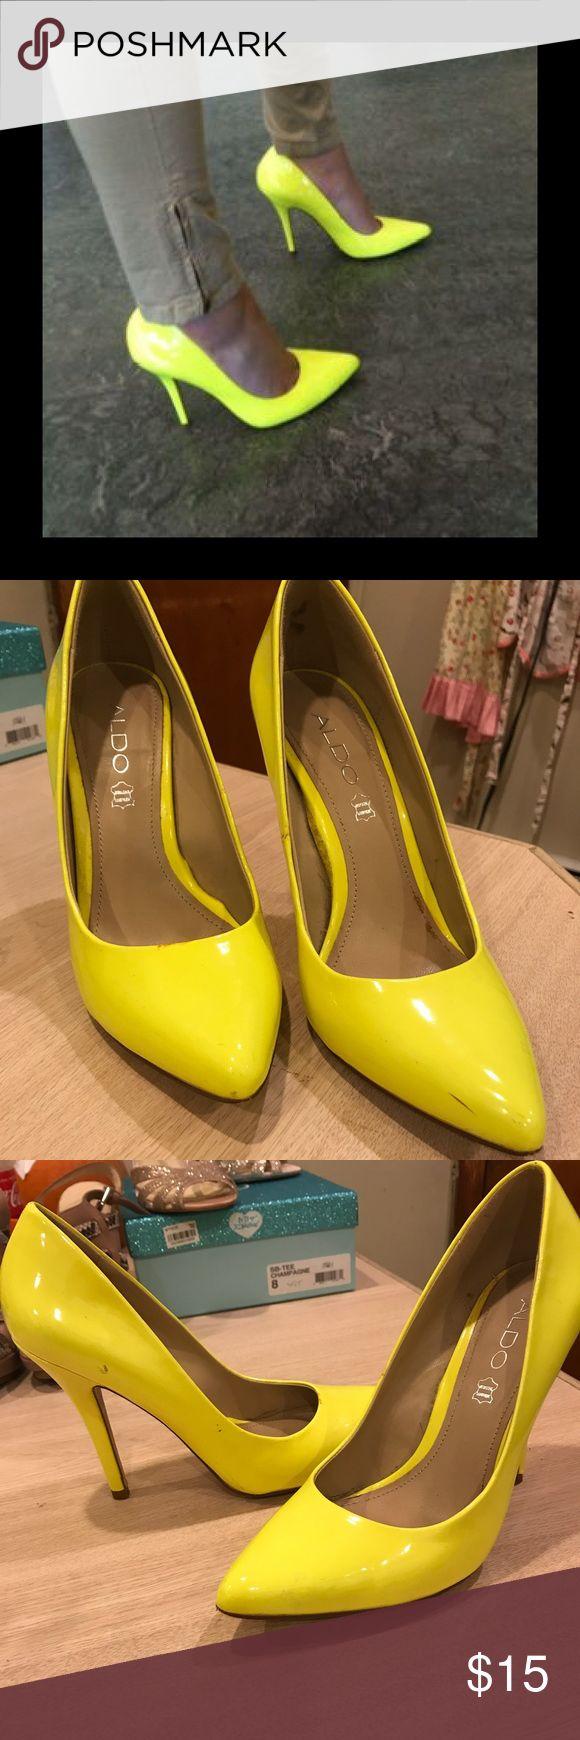 aldo, neon yellow shoes aldo size 38, never worn but some marks Aldo Shoes Heels